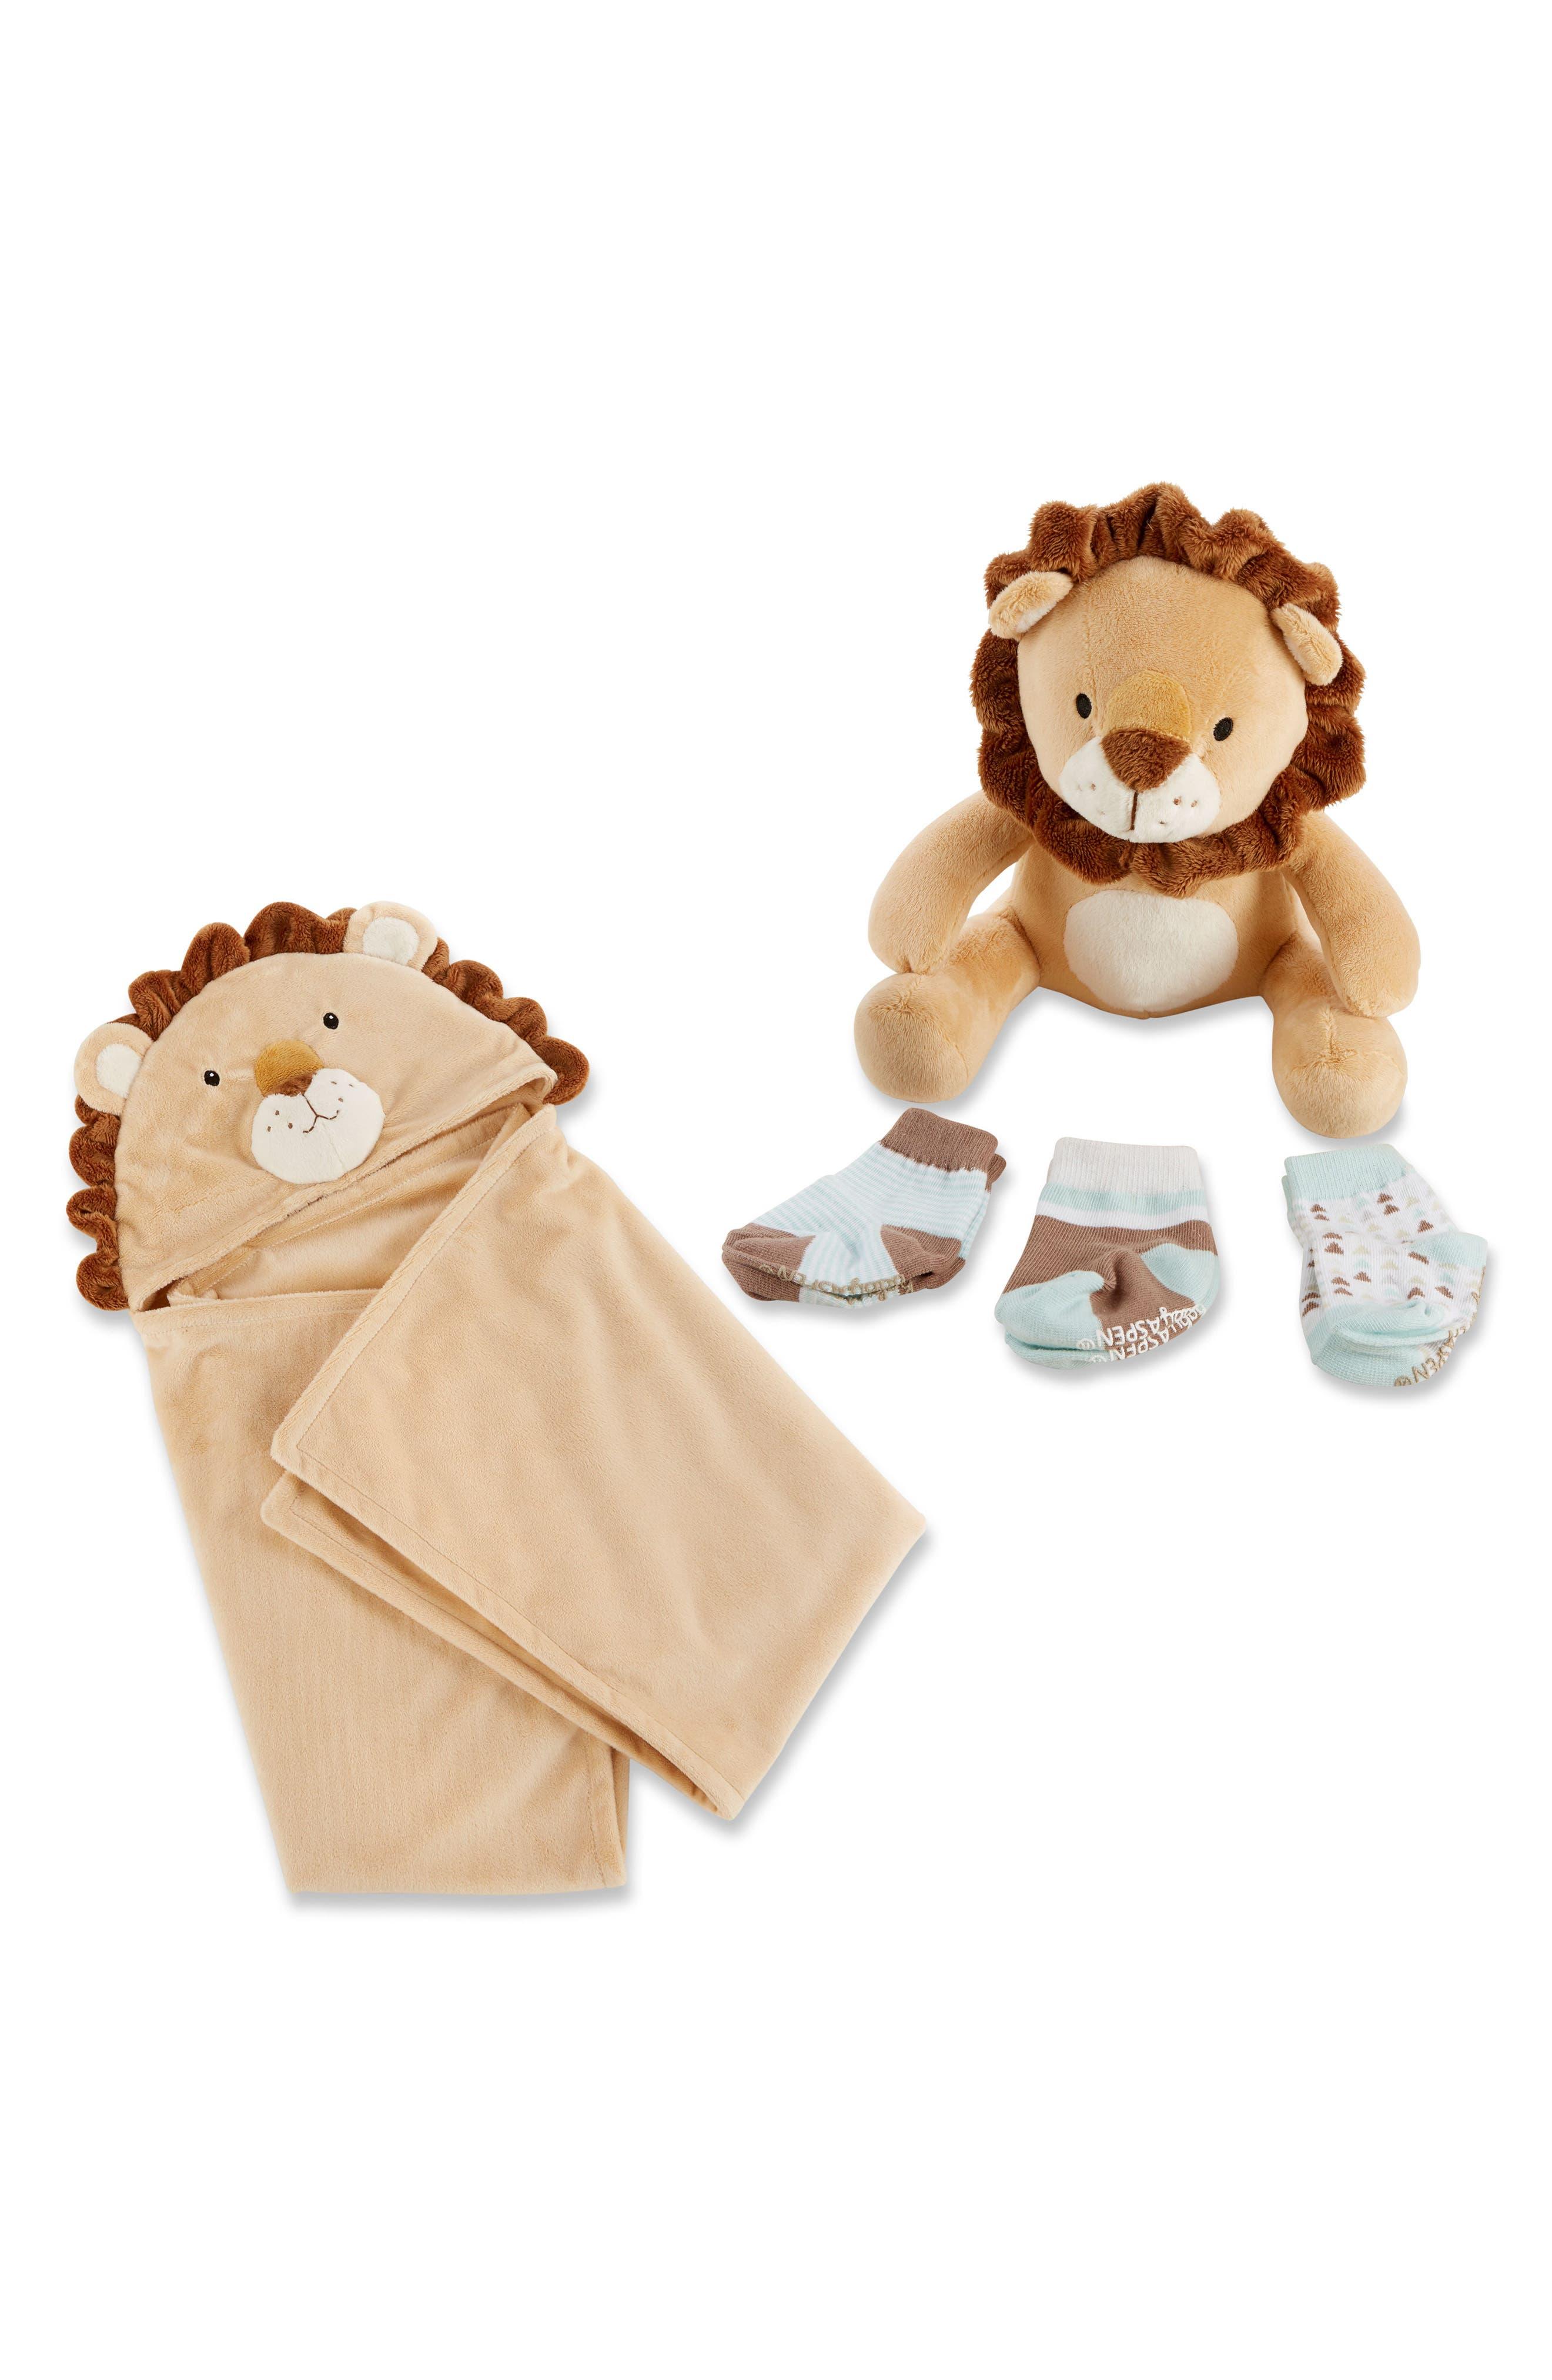 Lion Safari Hooded Blanket, 3-Pack Socks & Stuffed Animal Set,                             Main thumbnail 1, color,                             200